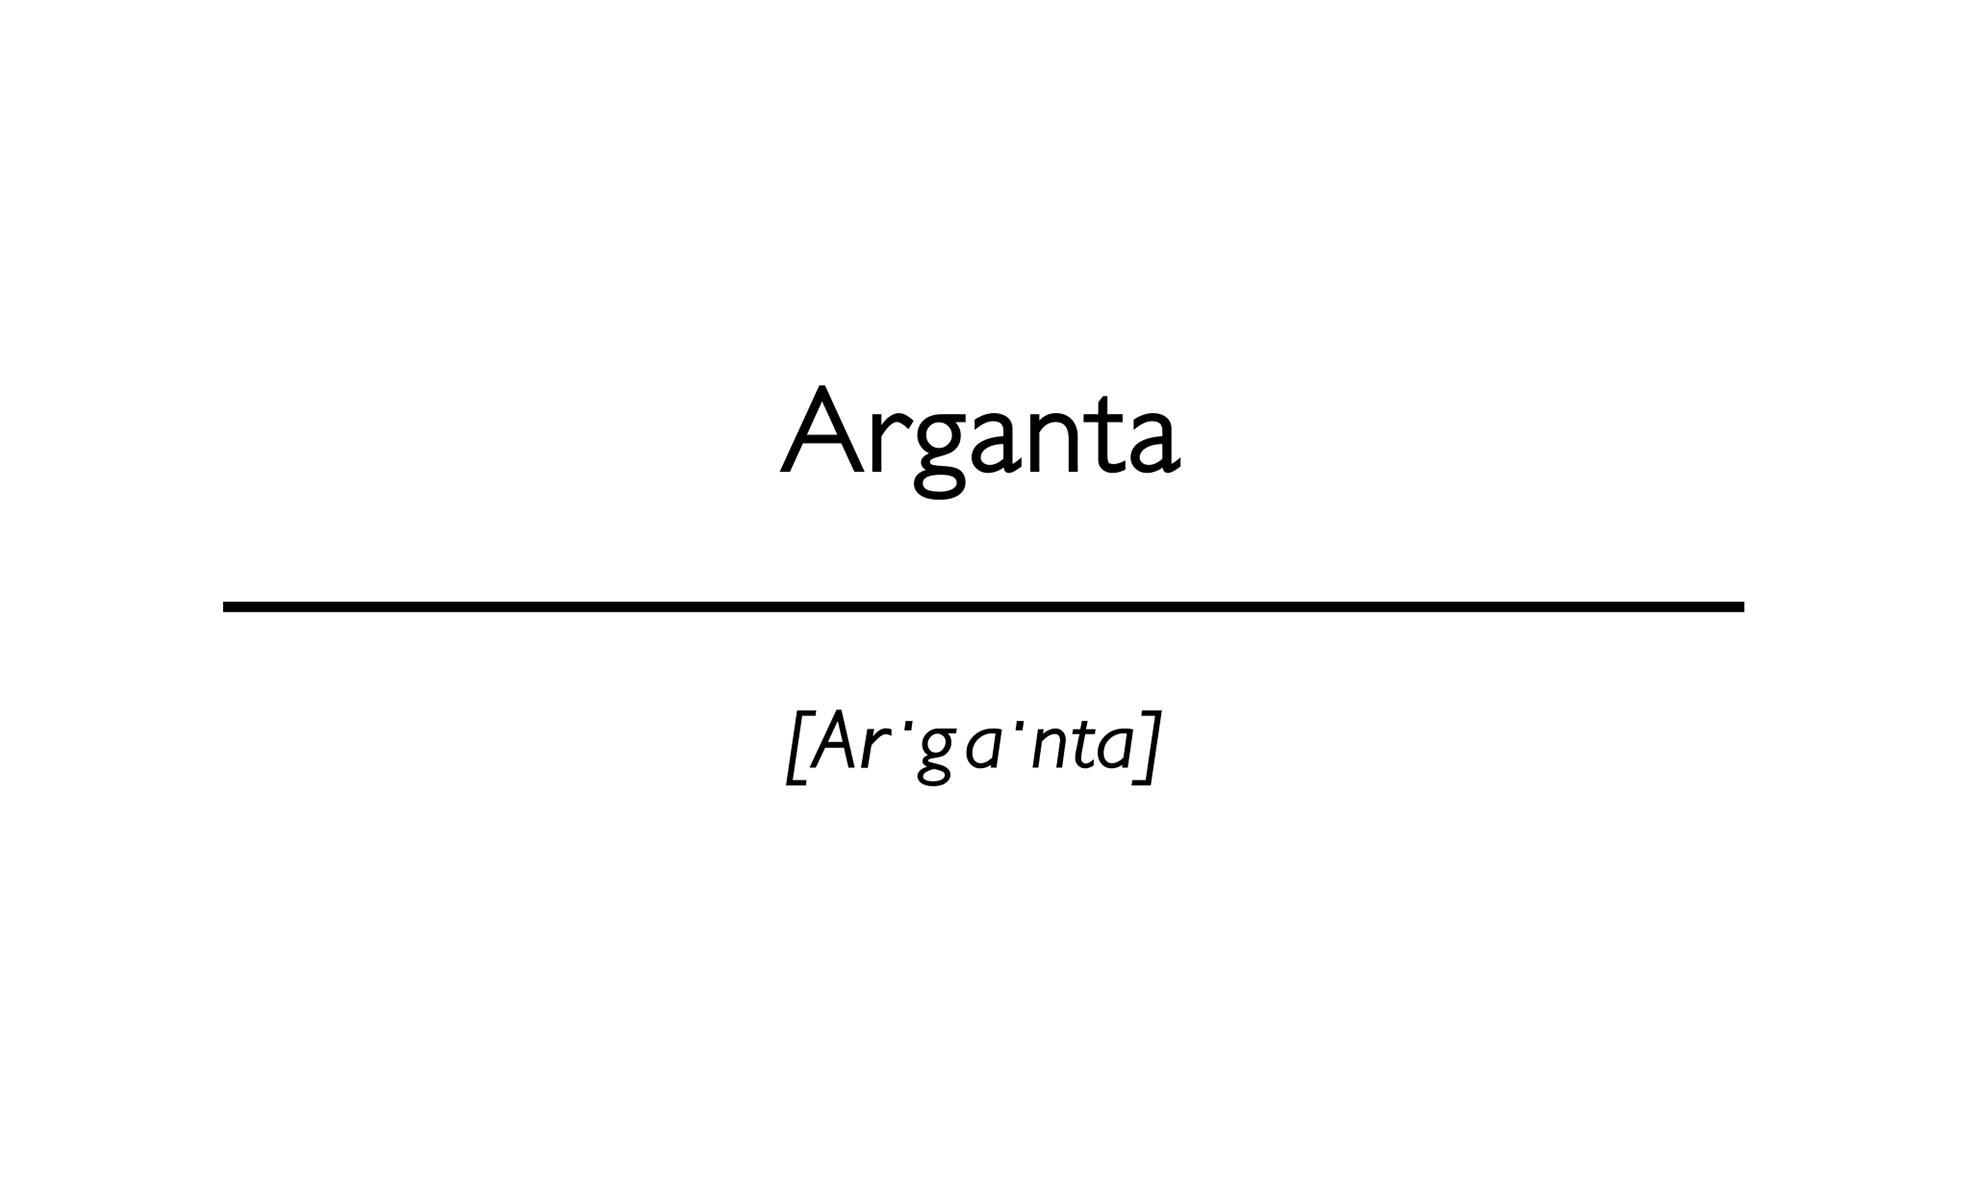 word Arganta